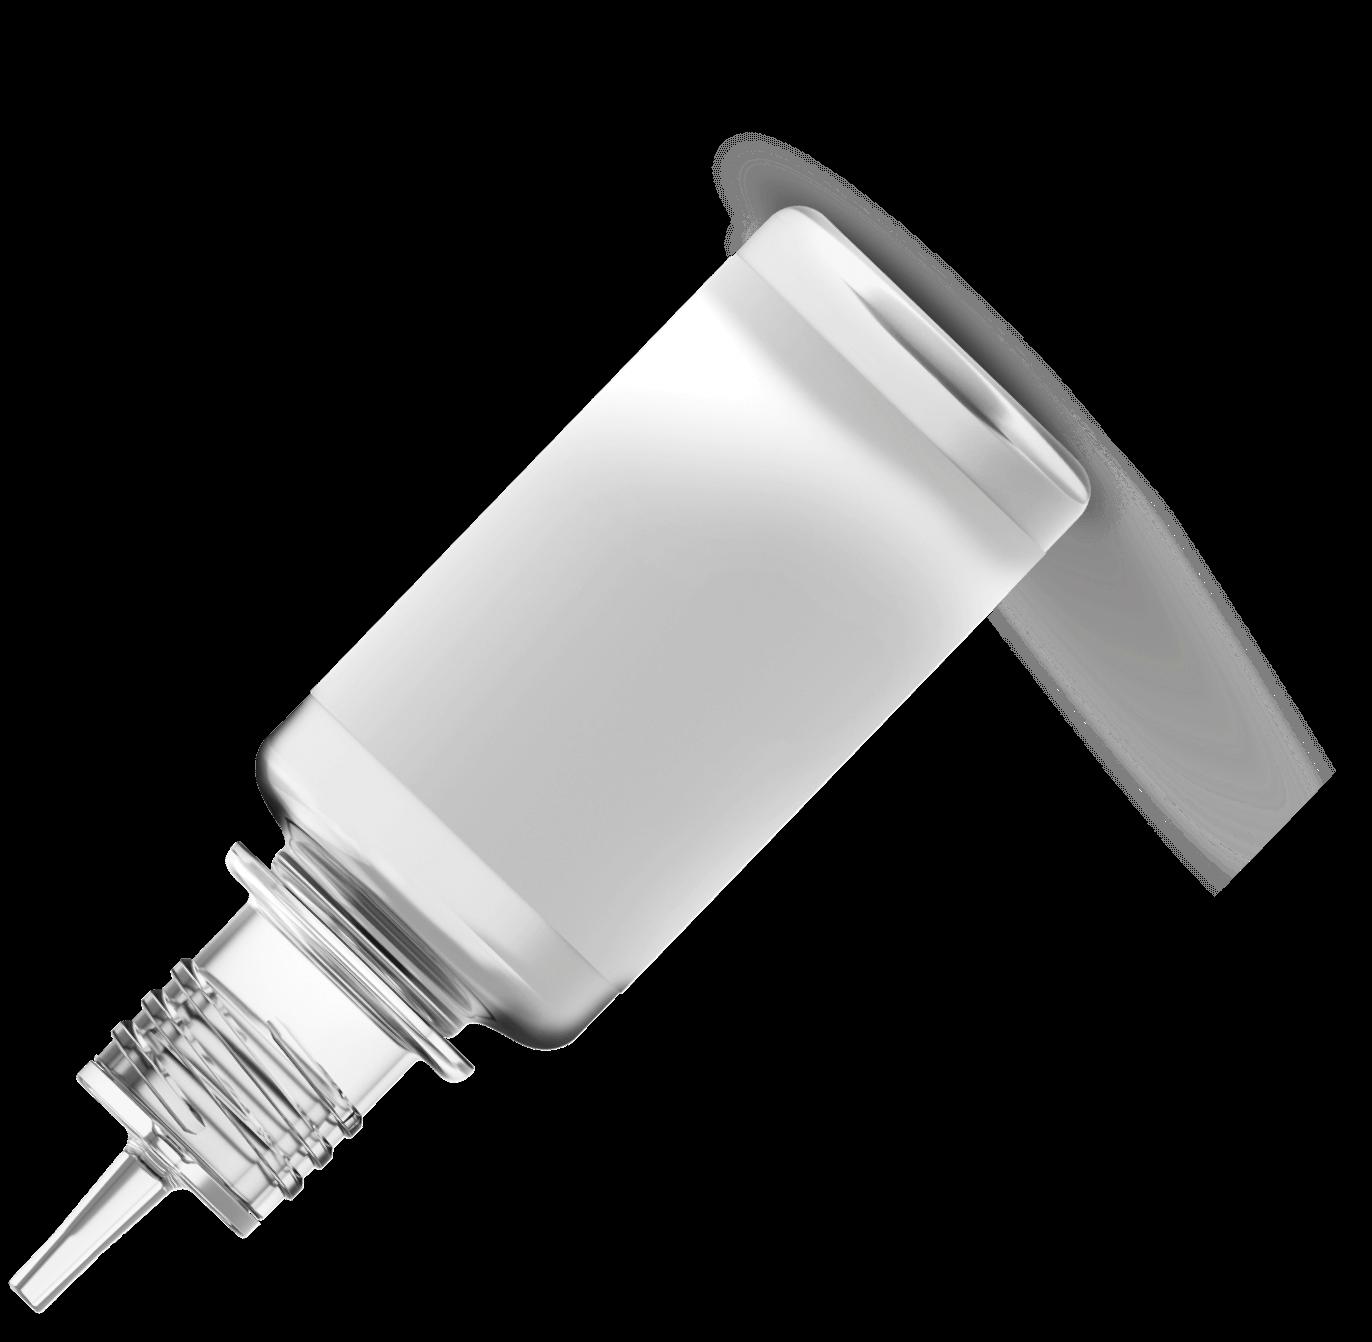 Quality e-liquids made in the UK